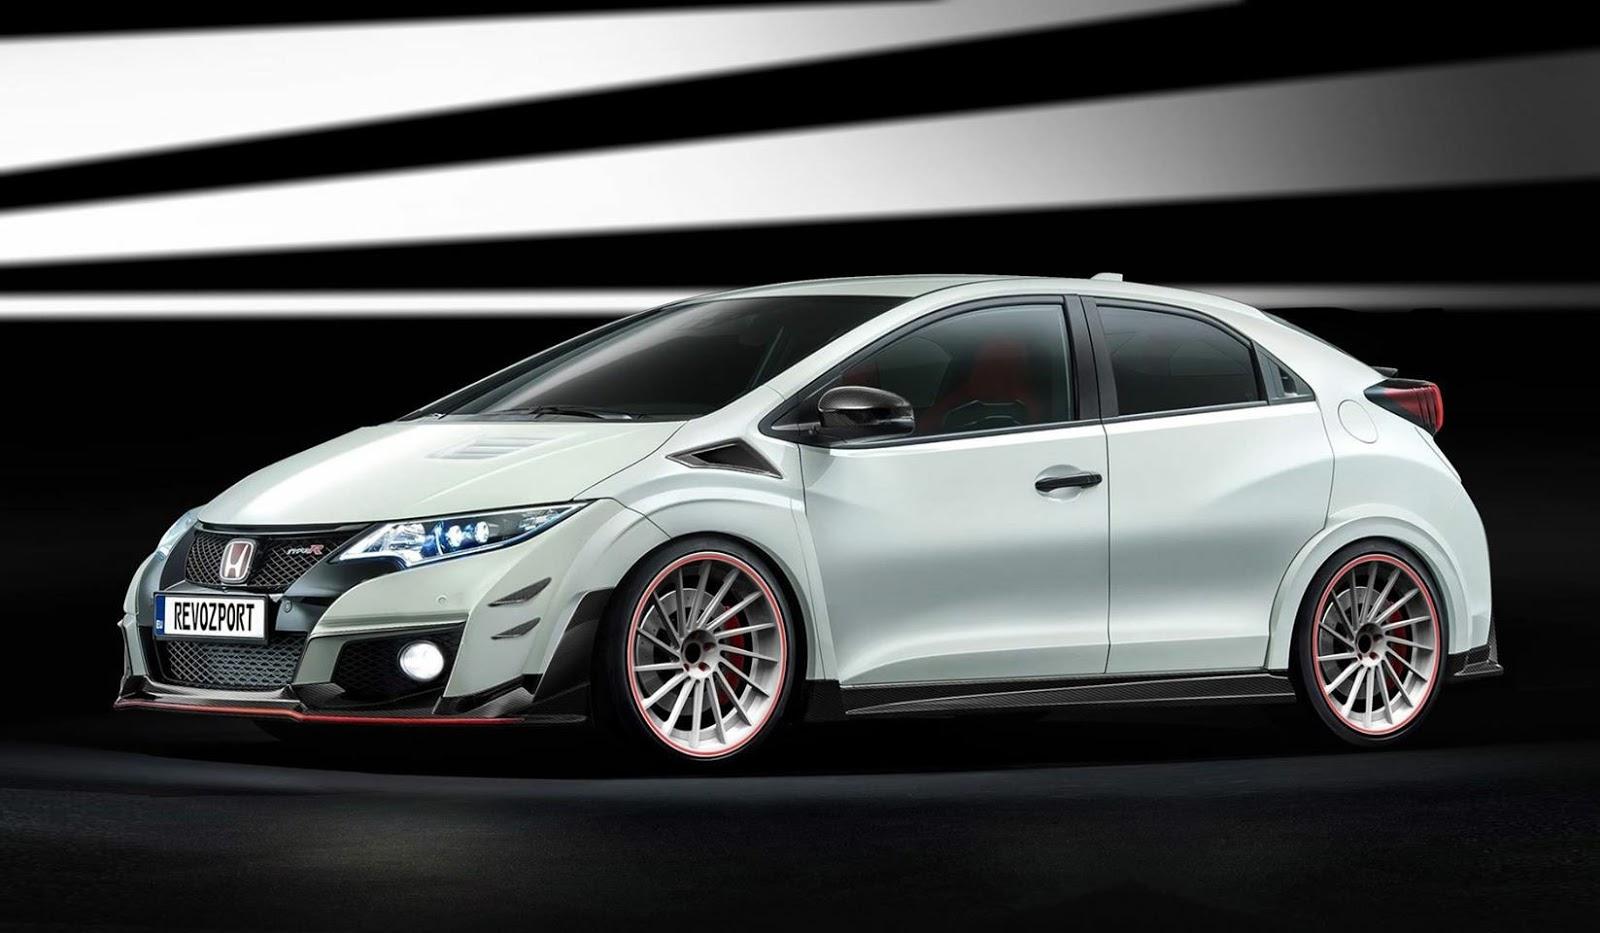 Honda Civic Type R Gets RevoZport Body Kits | carscoops.com